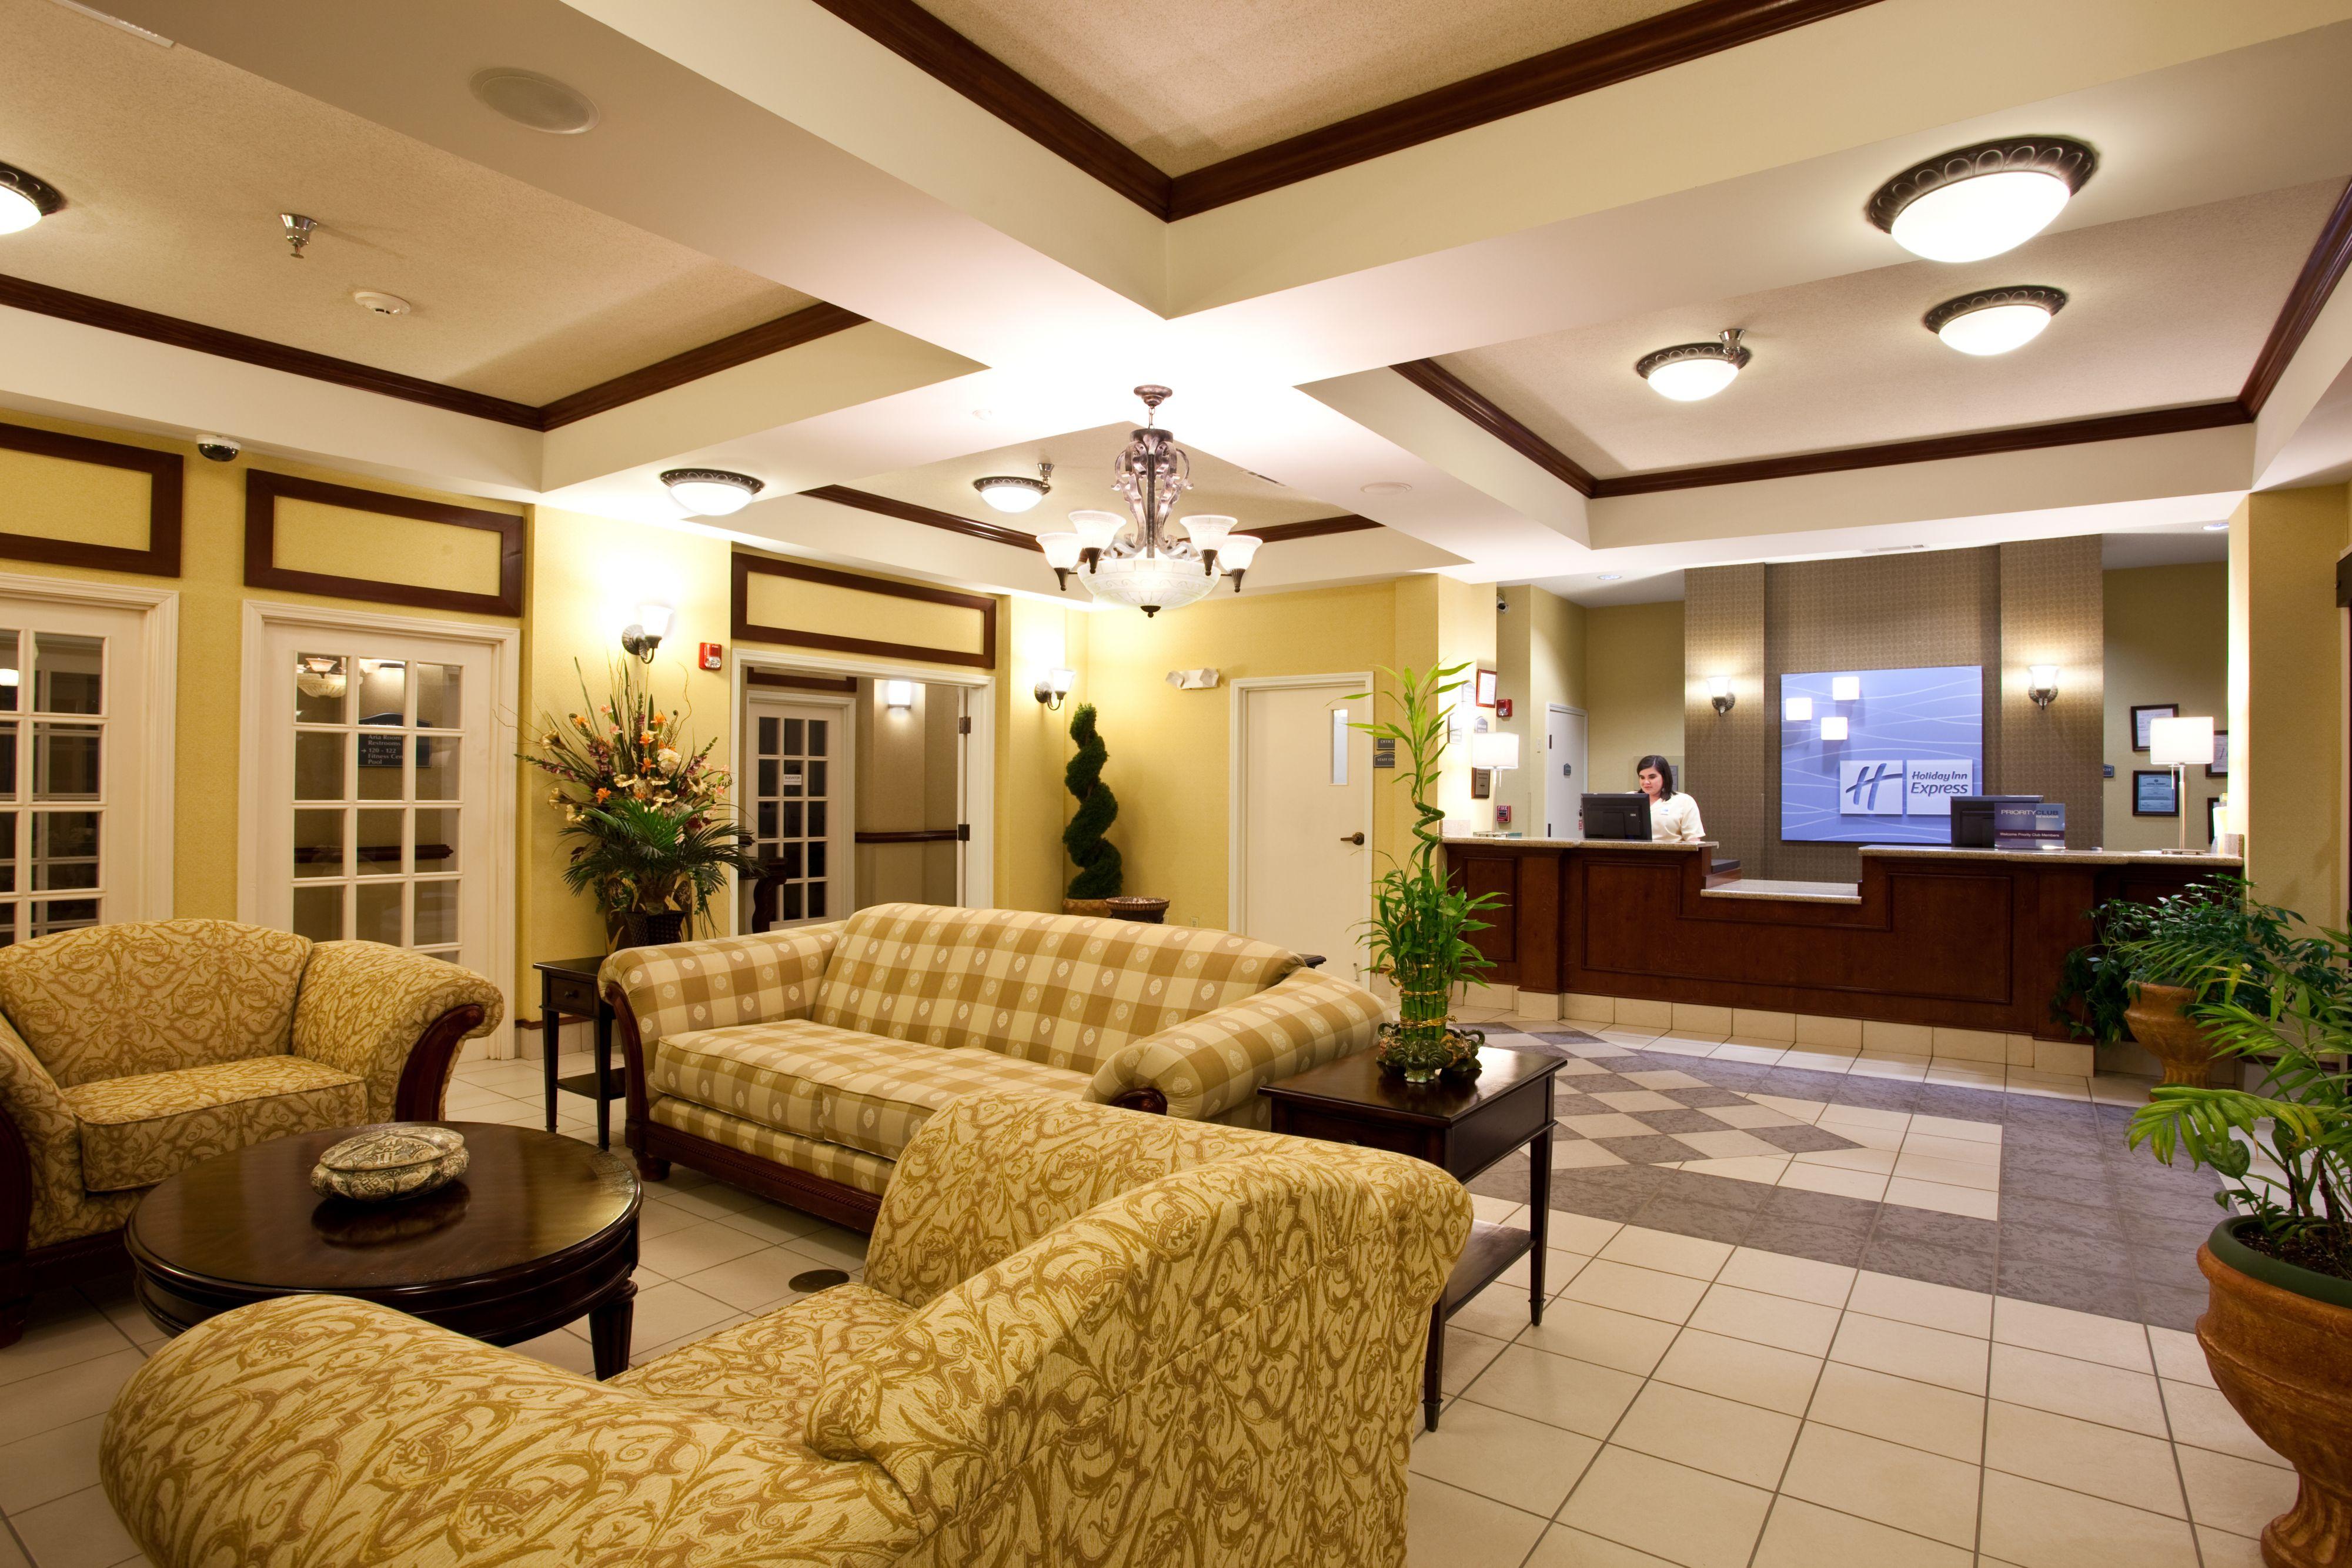 Holiday Inn Express Clanton image 4